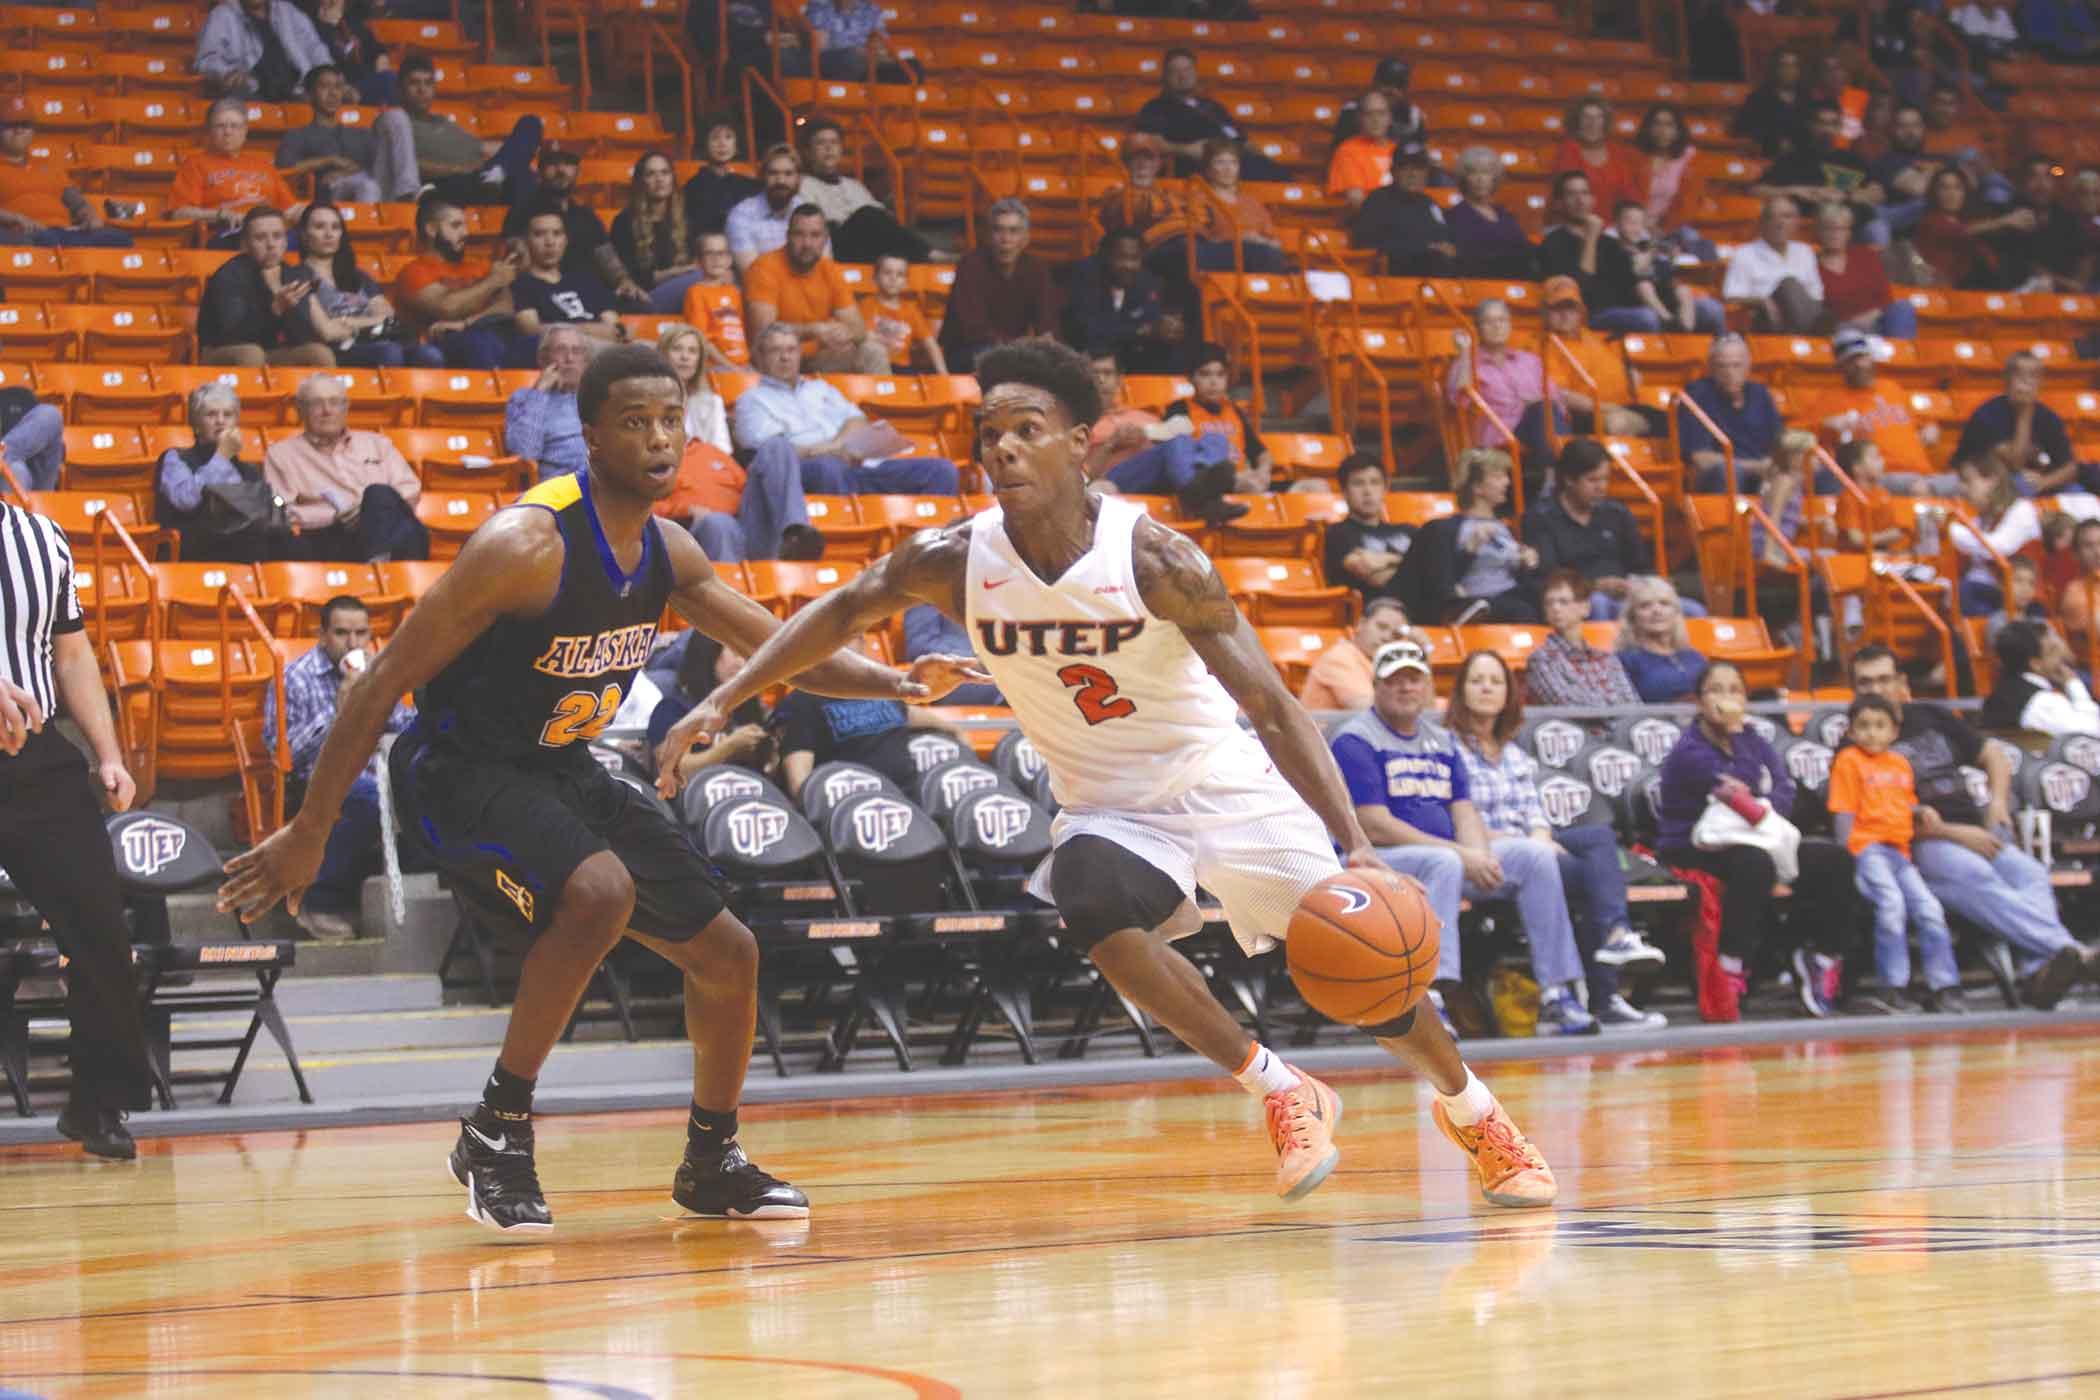 UTEP men's basketball will start their season on Saturday, Nov. 12, against Louisiana College.